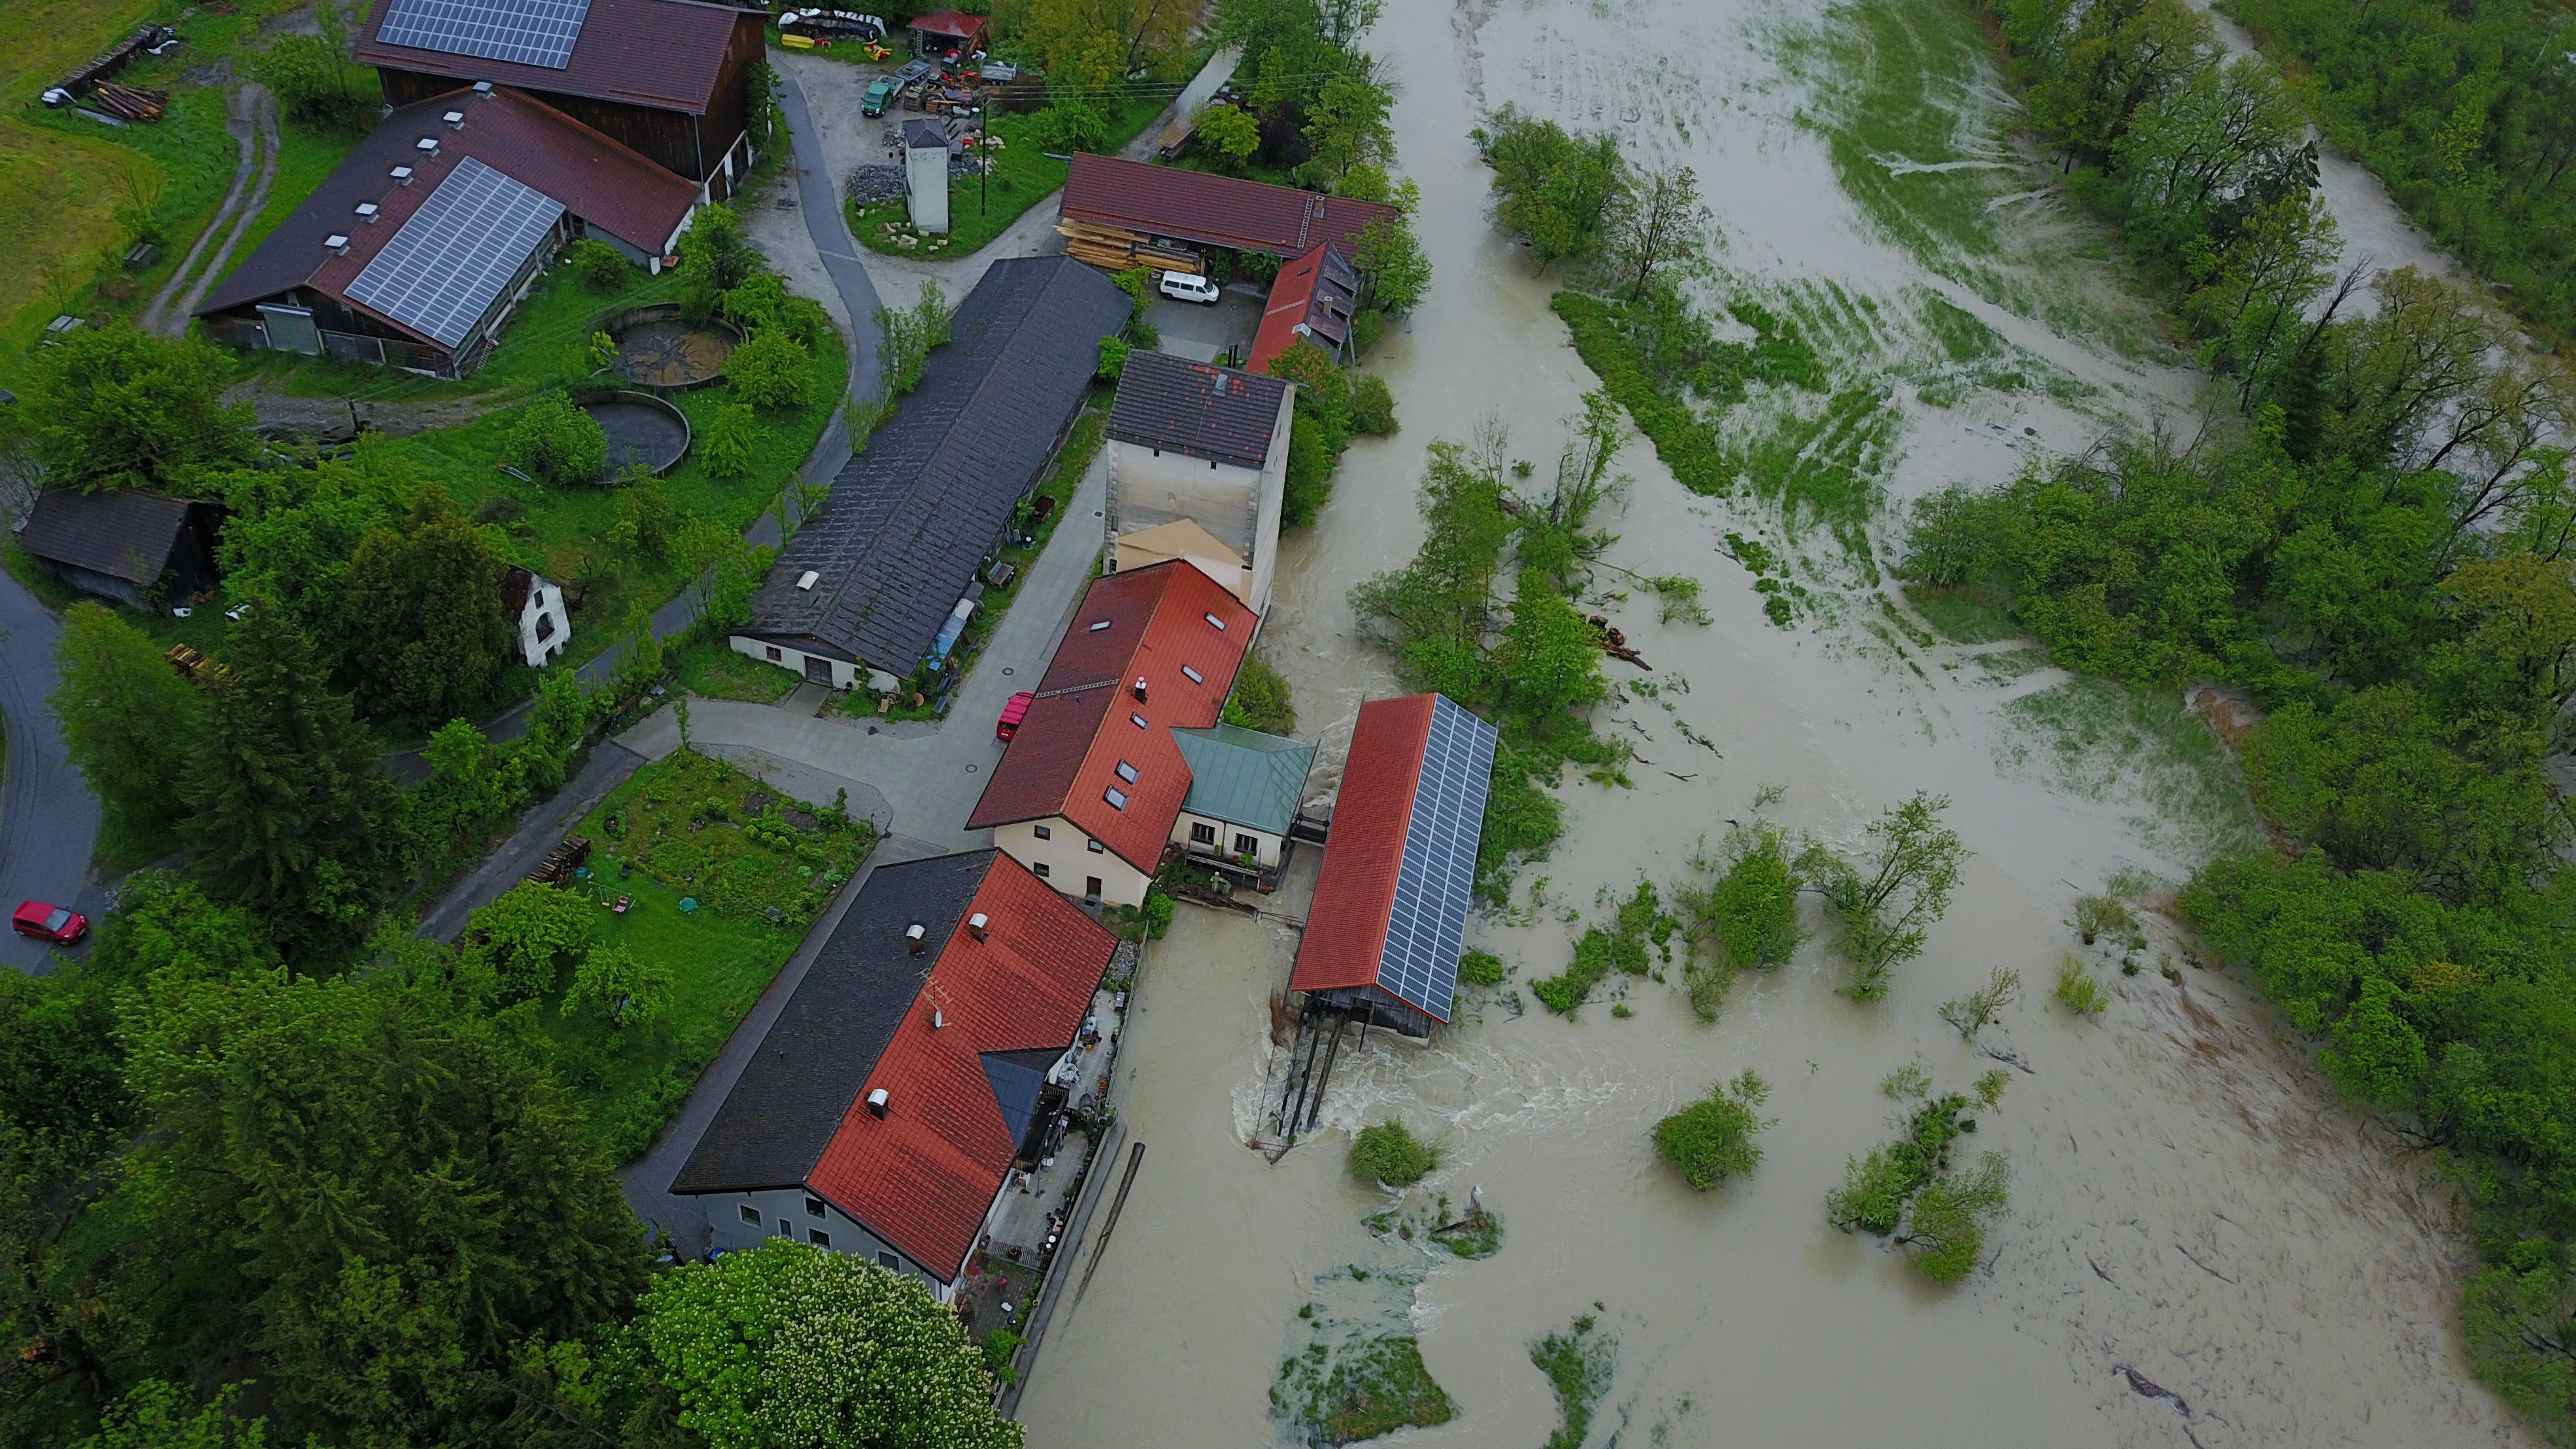 Hochwasser im Mai 2019 in Murnau